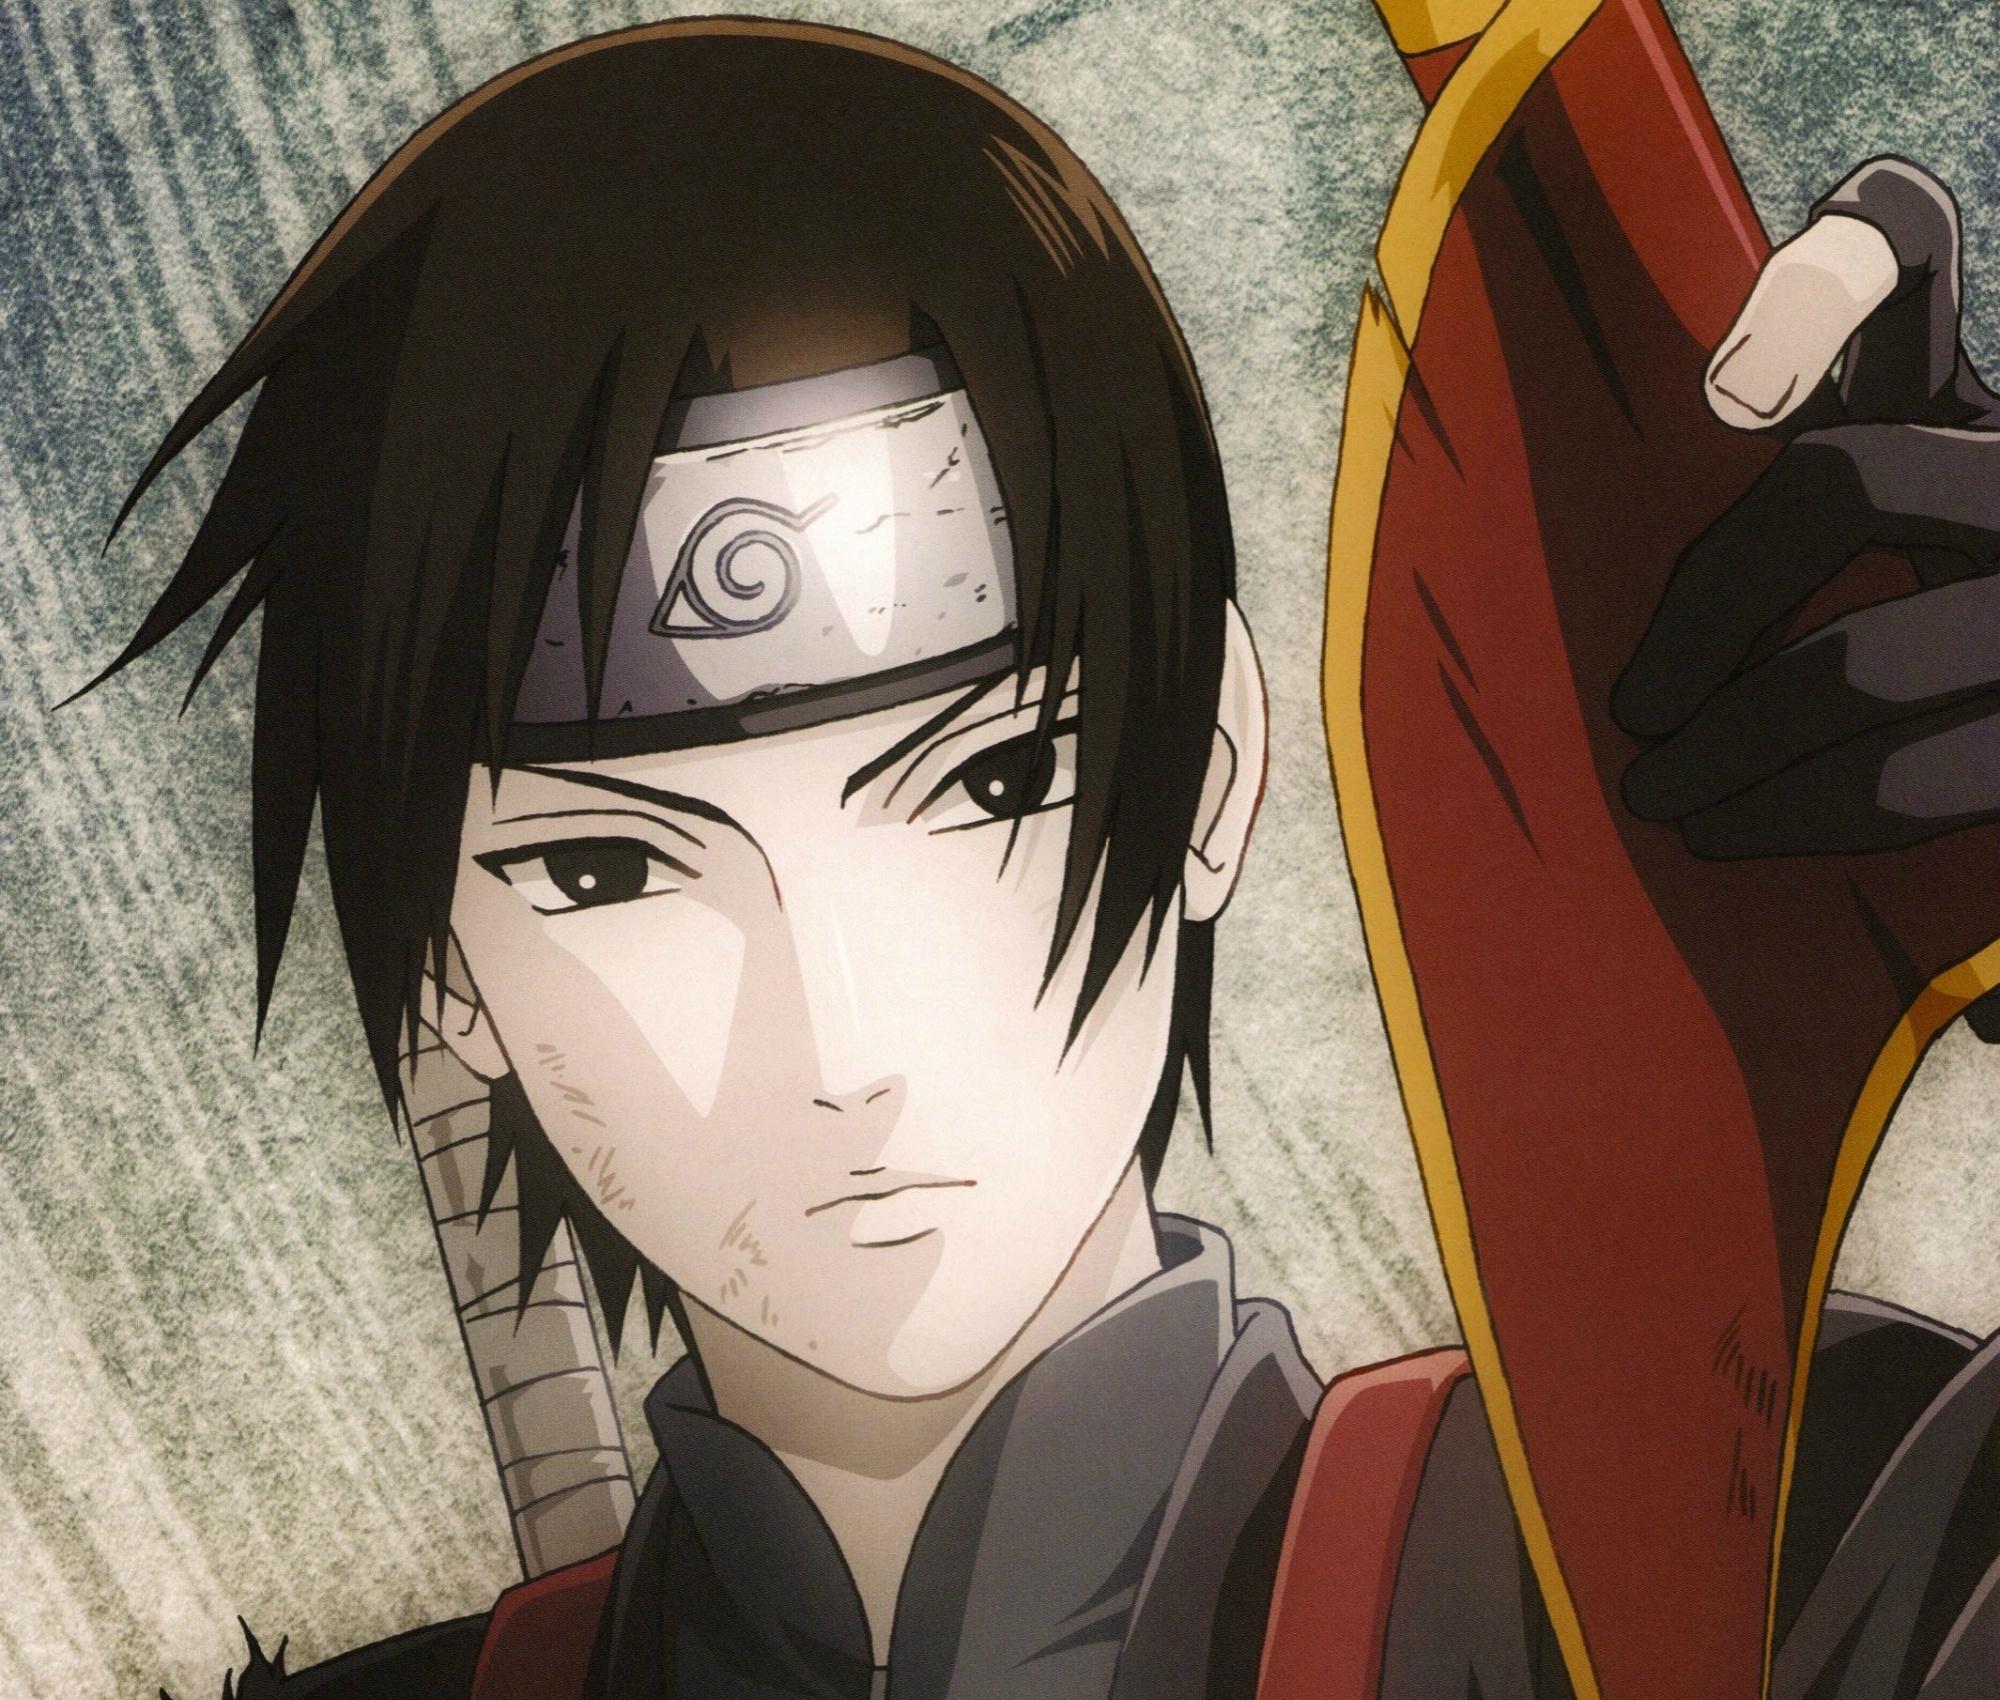 Anime Wallpaper Naruto Shippuden Sai Full Hd Wallpaper And Background Image 2000x1700